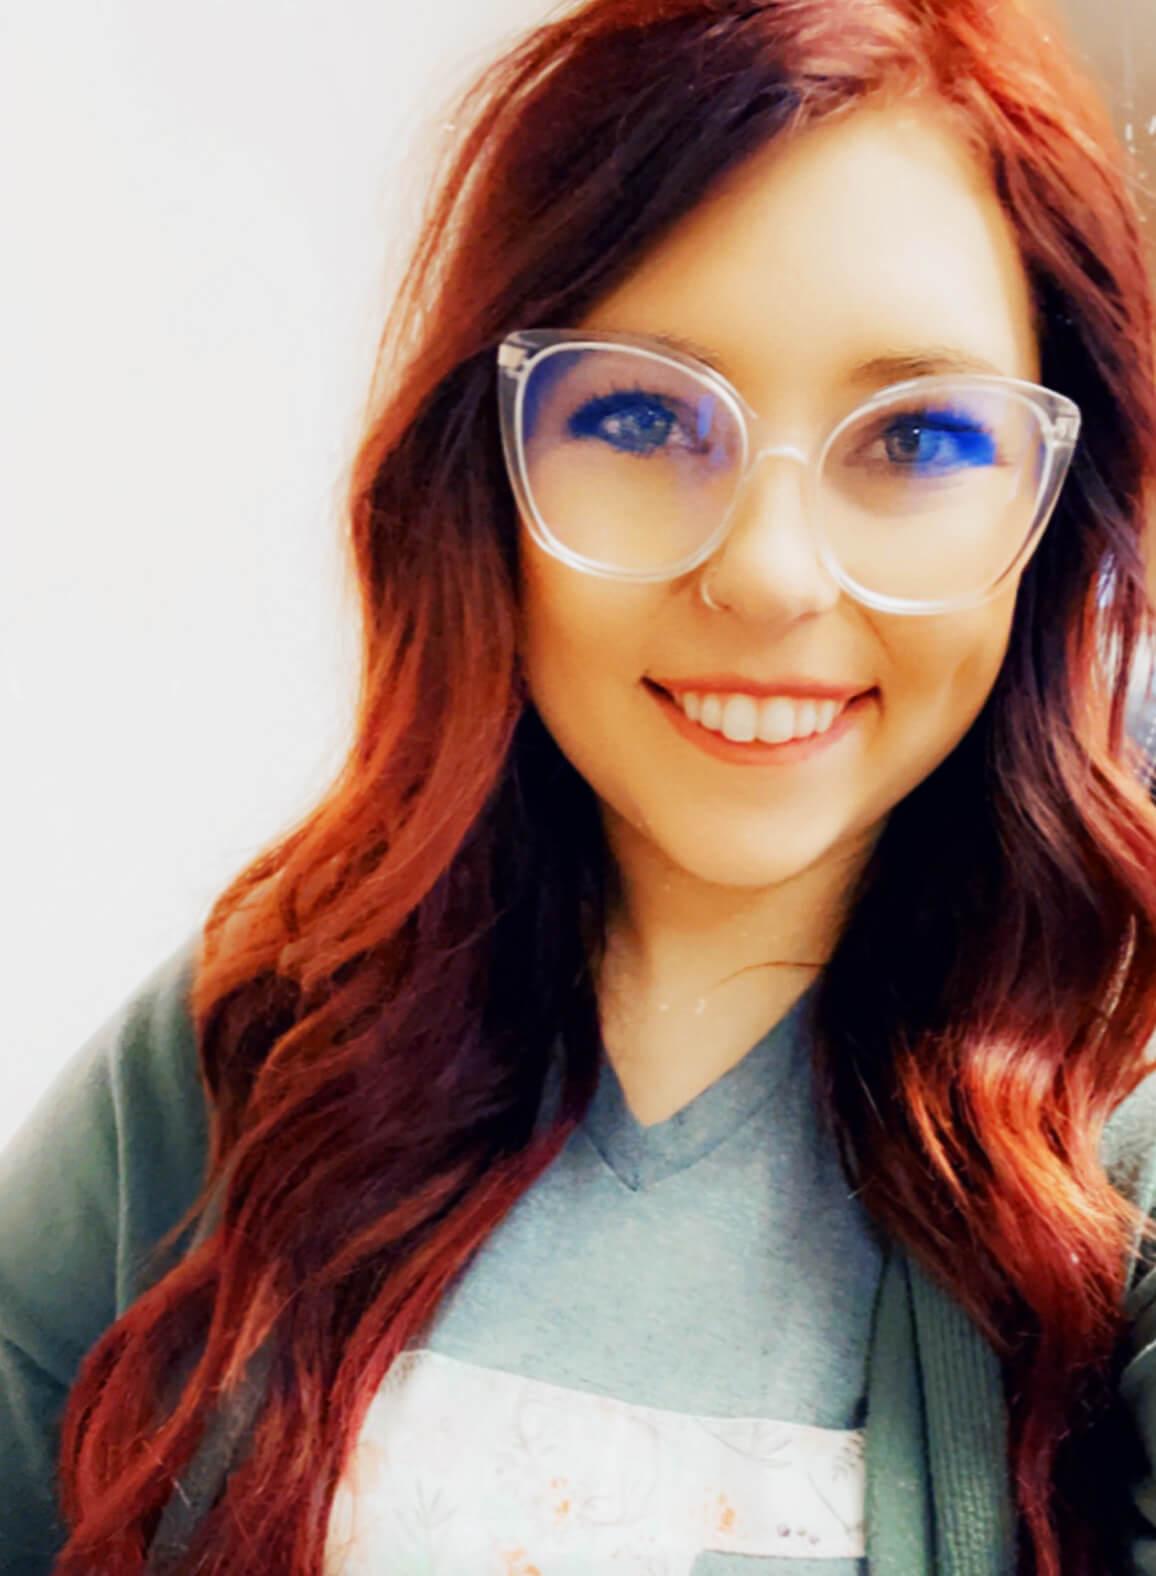 jessica Richardson headshot - health insurance coverage provider in ponca city oklahoma